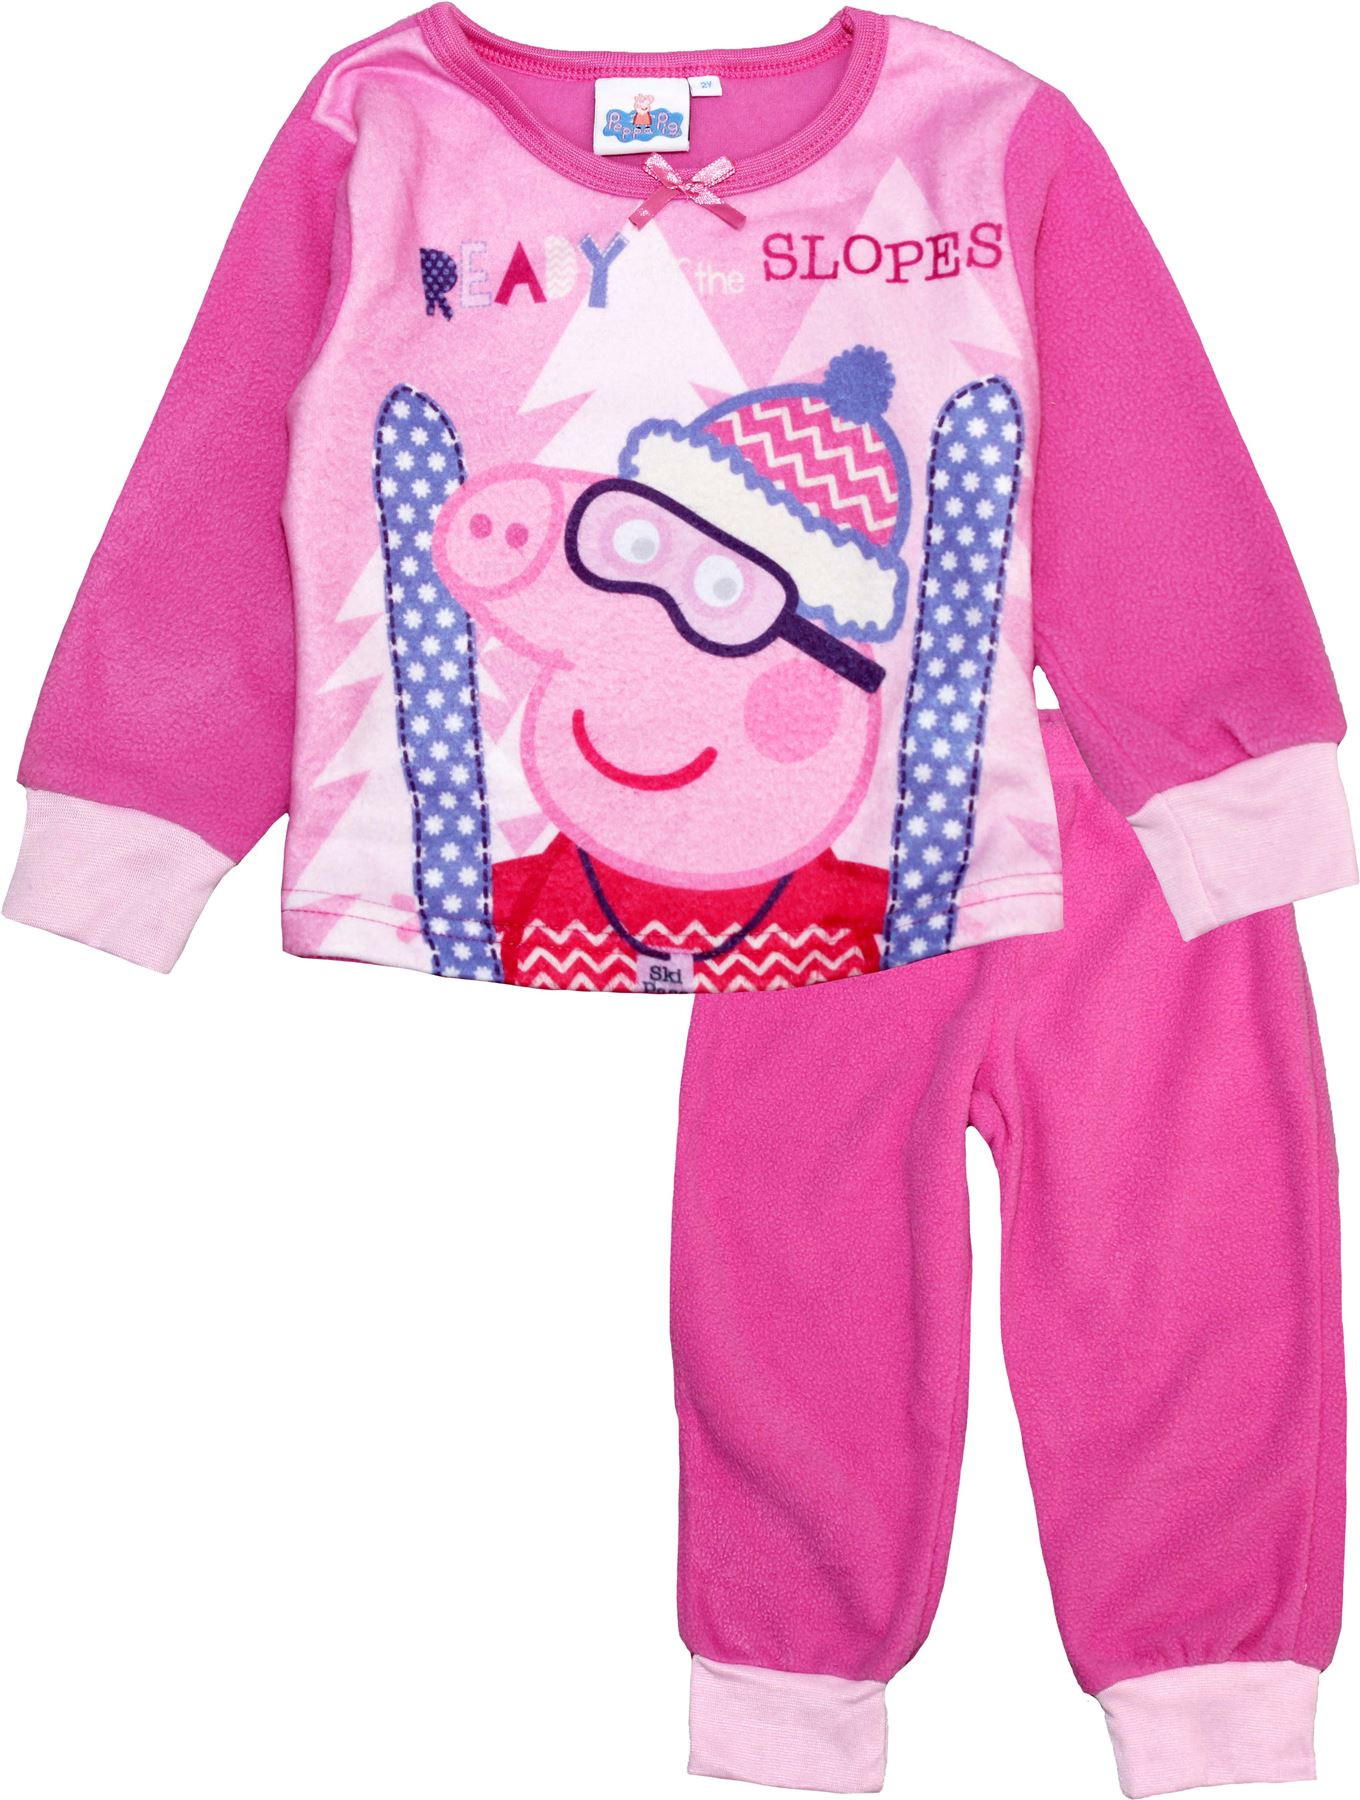 Peppa Pig Fleece Nightwear (2-16 Years) for Girls  d3efeb221